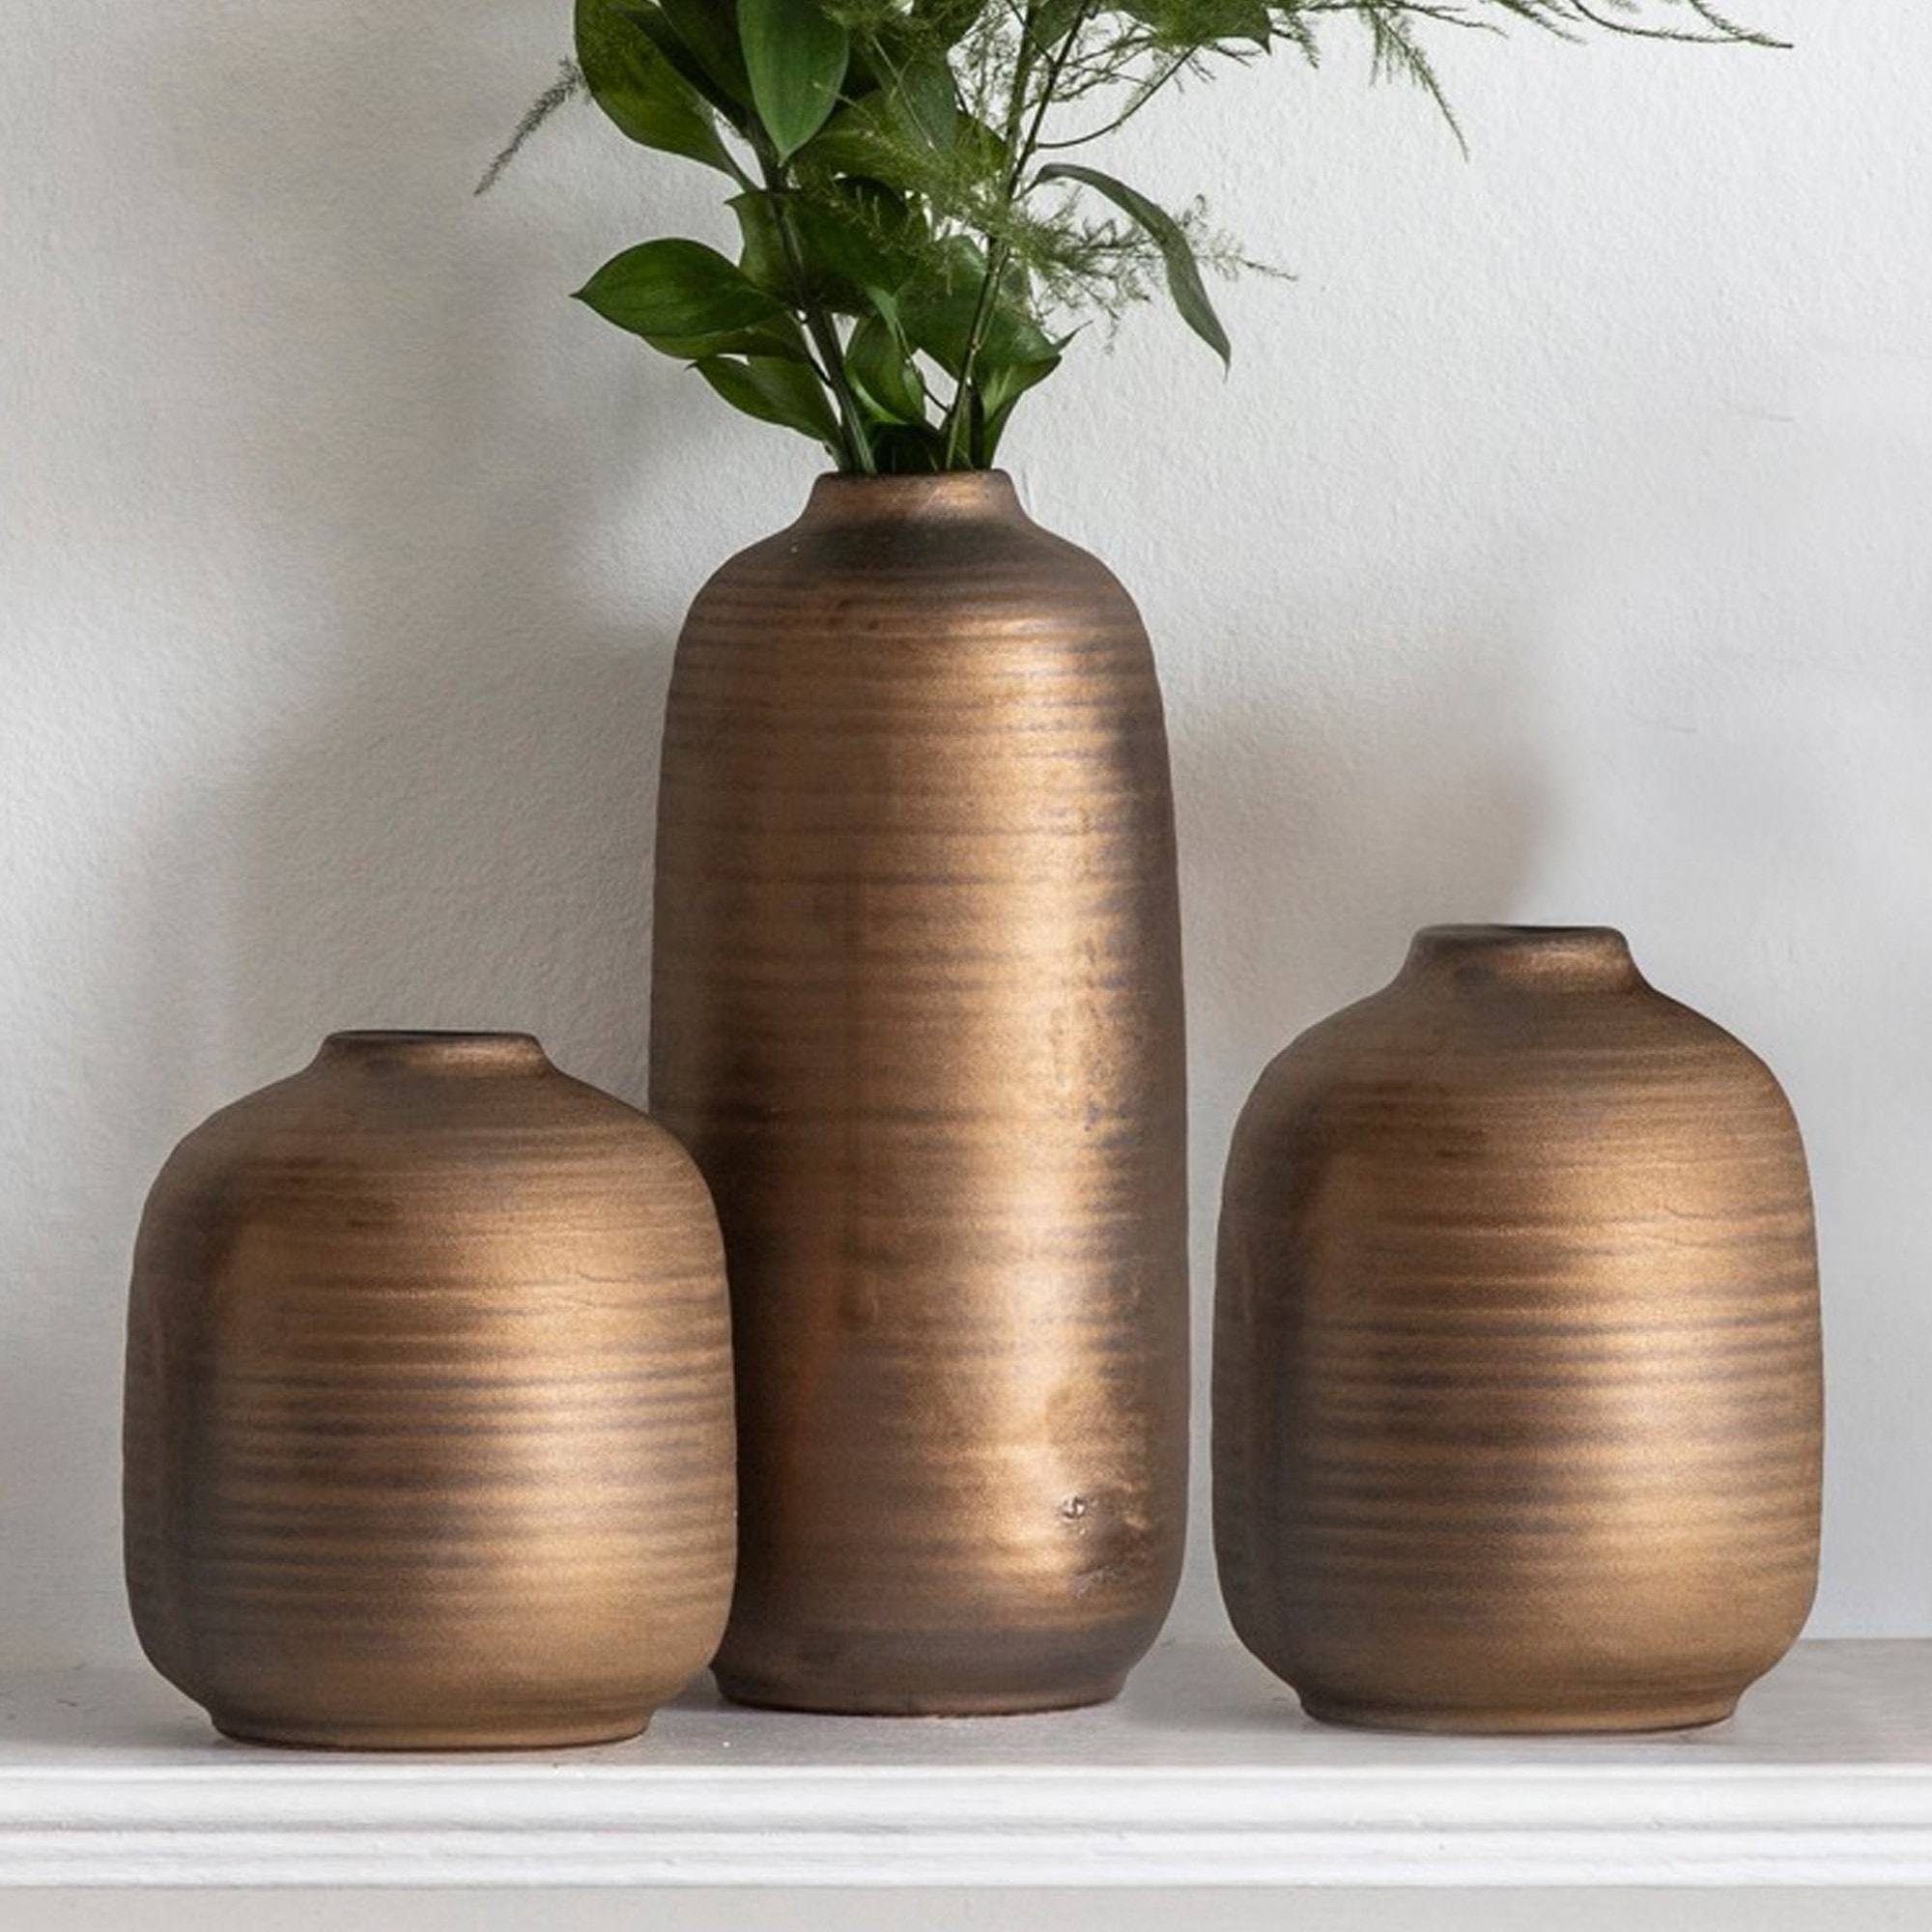 Khangi Vases Set Of 3 Copper Vases Gold Vases